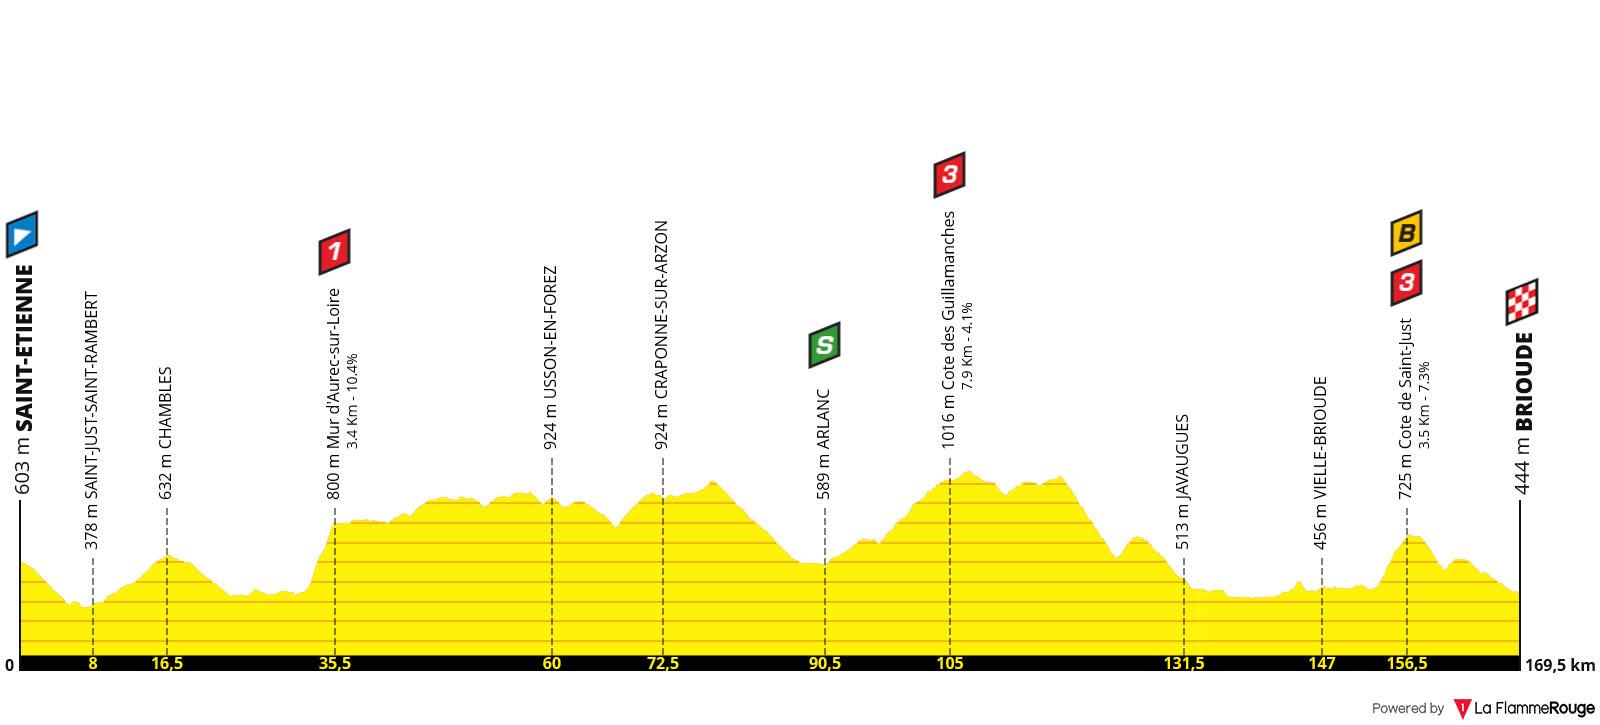 Perfil Etapa 09 - Tour de Francia 2019